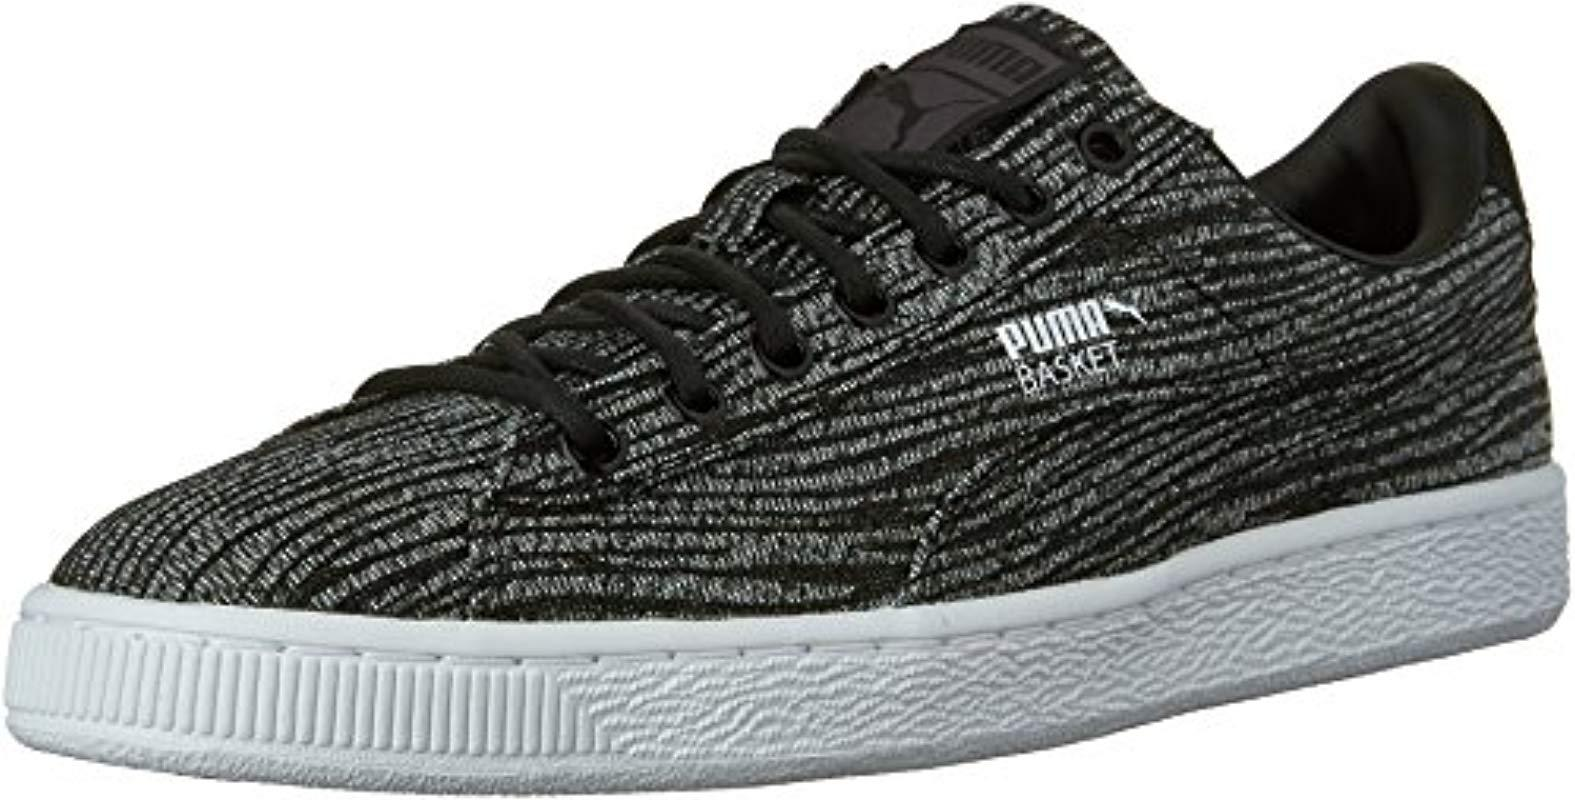 fbe9ea23f020c Lyst - PUMA Basket Classic Tiger Mesh Fashion Sneaker in Black for Men